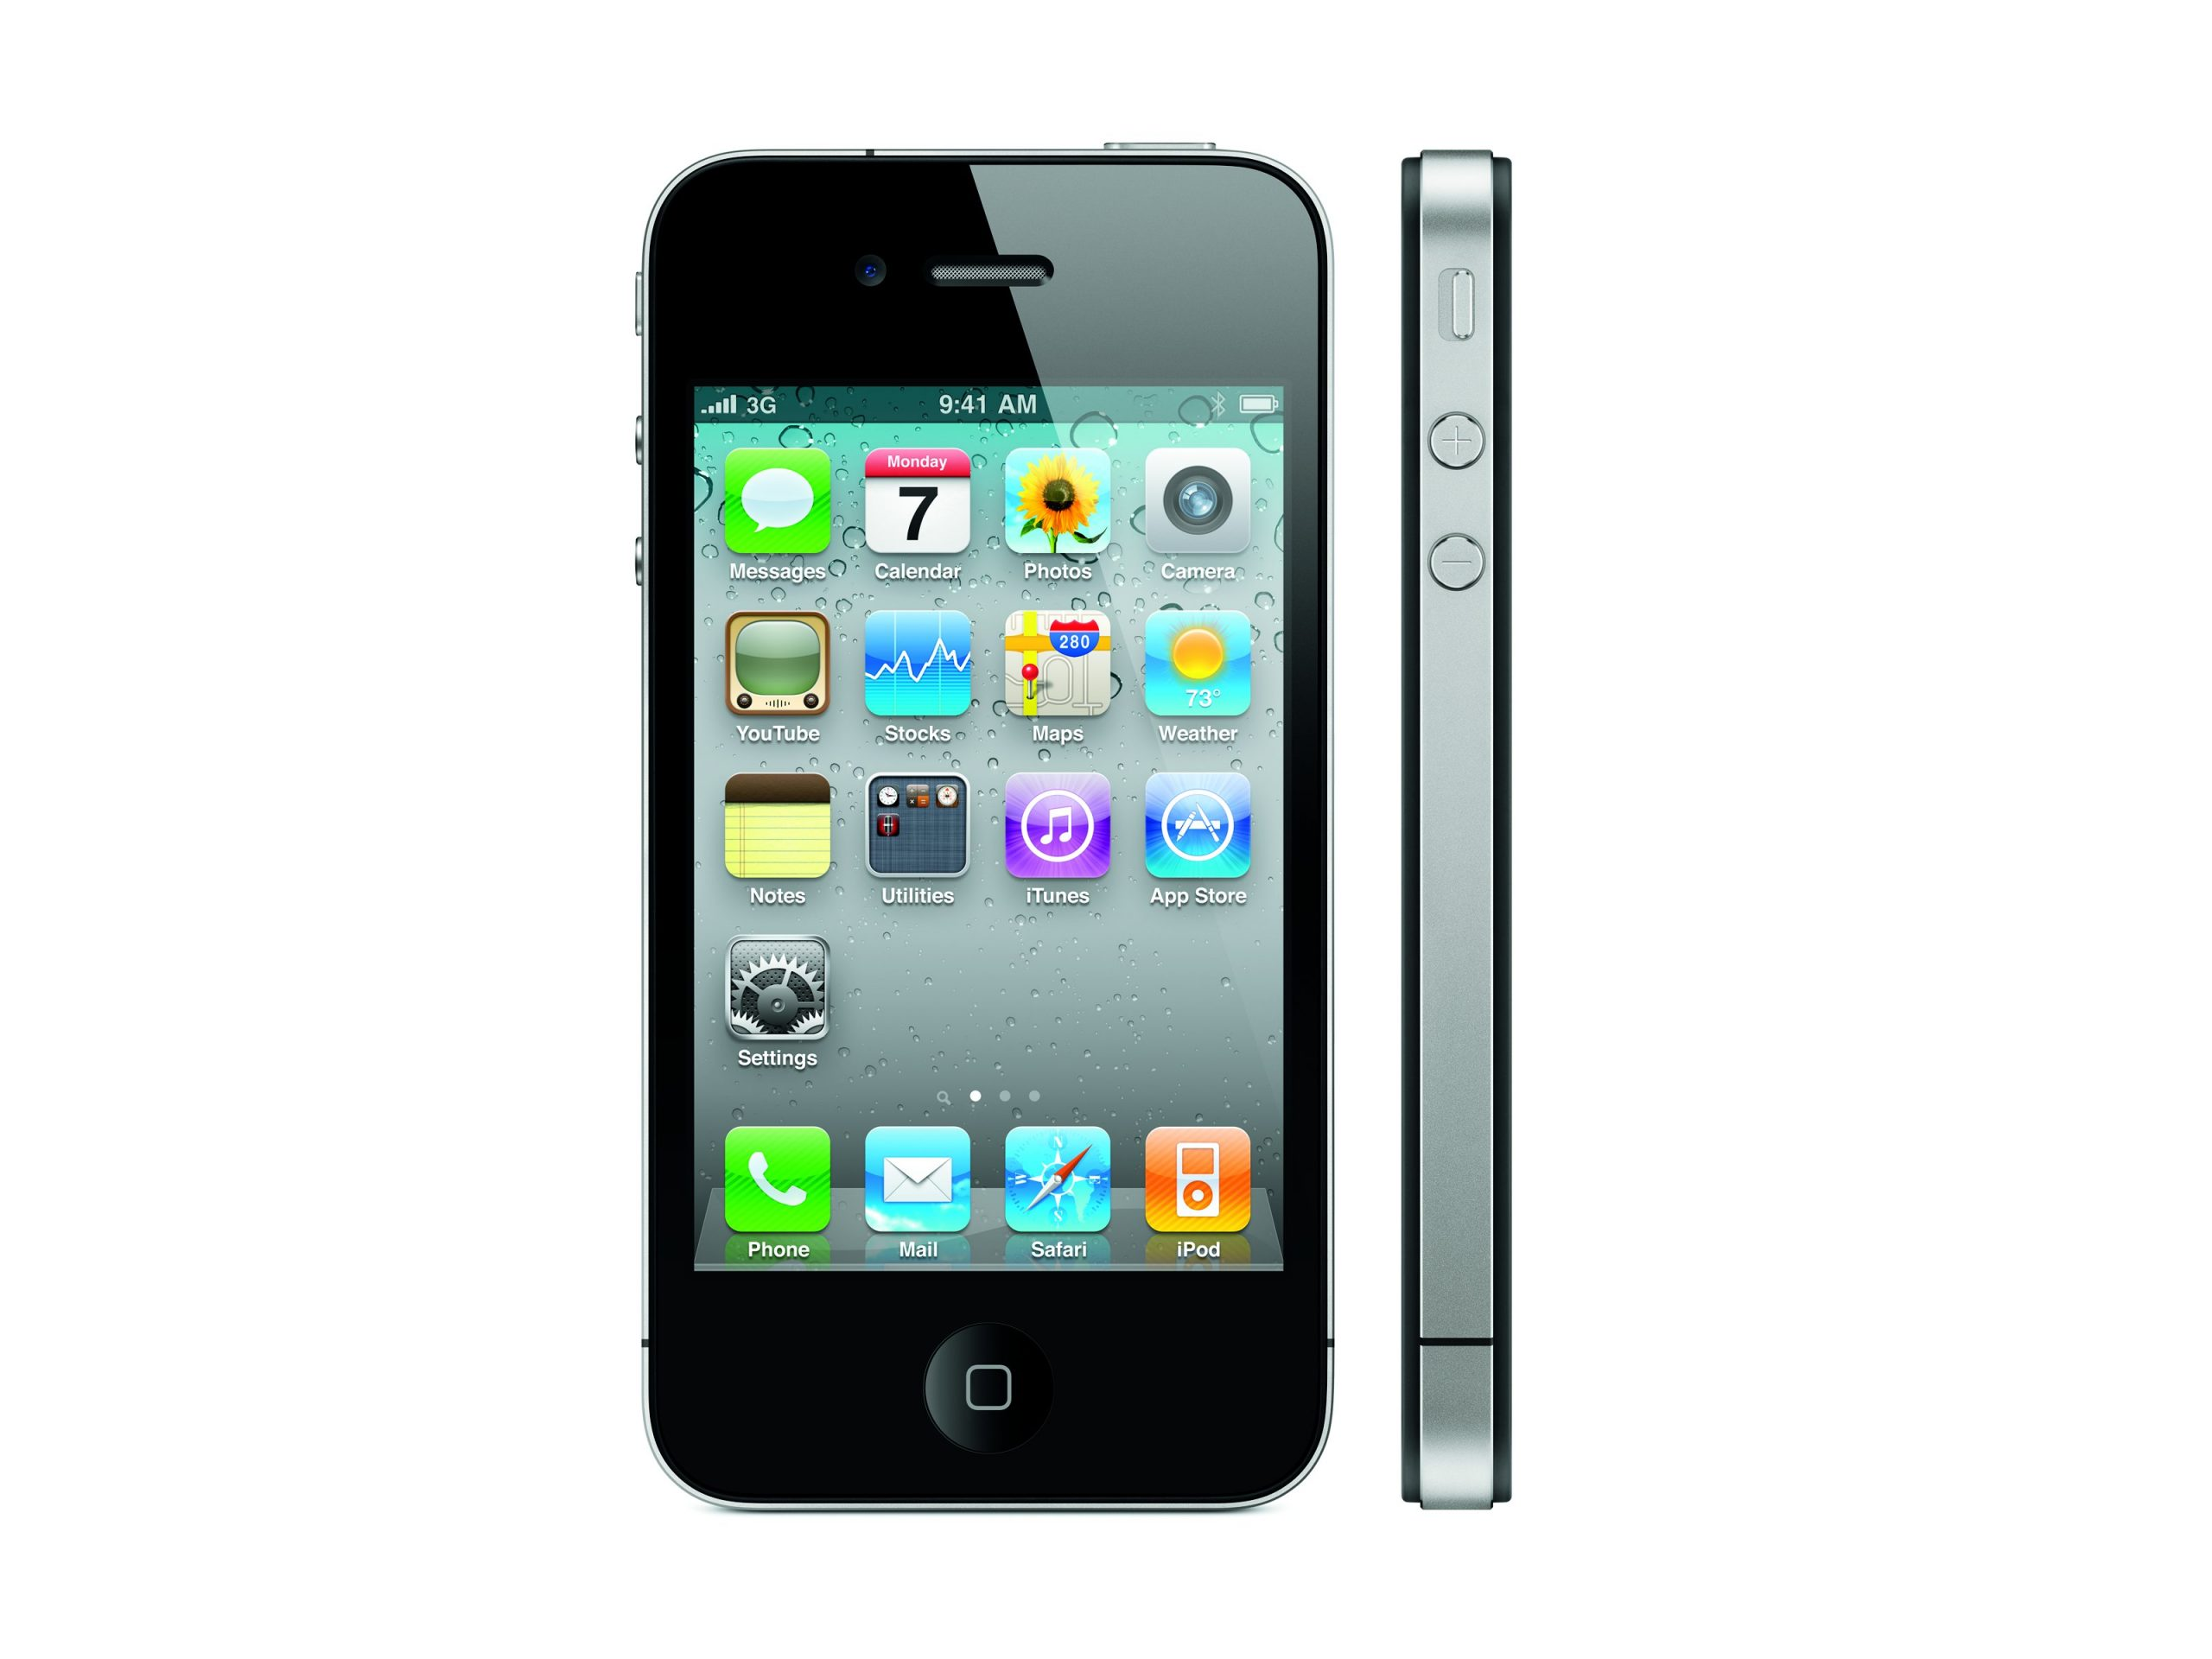 Apple iPhone 4 , Apple iPhone 4 Cam ,Apple iPhone 4 Camera test,Apple iPhone 4 Screen Repair, Apple iPhone 4 Camera, Apple iPhone 4 Unboxing, Apple iPhone 4 Hands-on